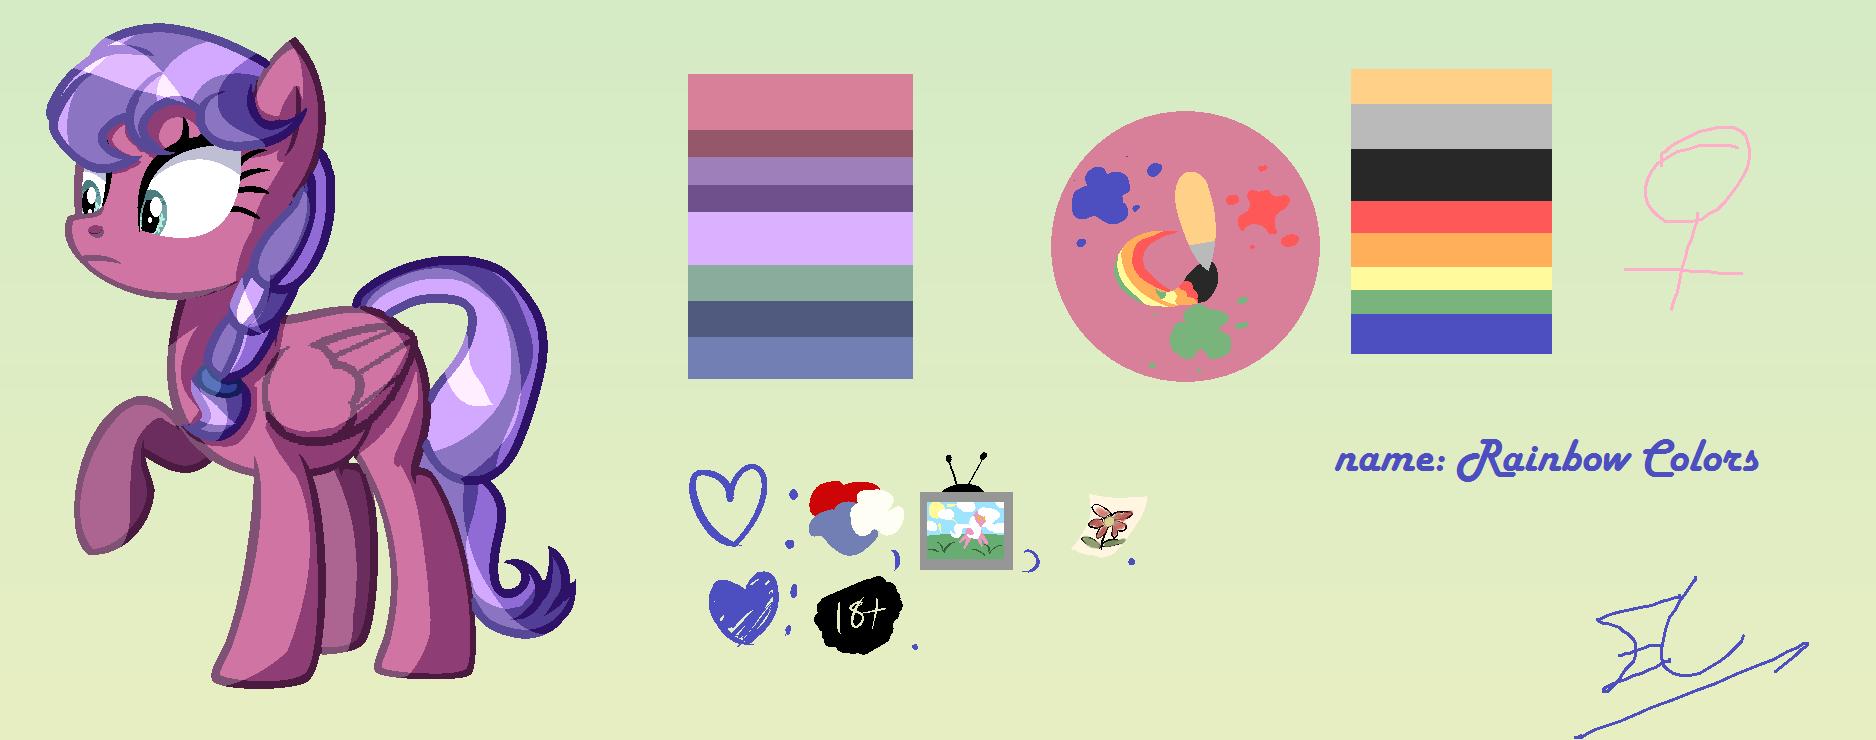 Rainbow Colors by Serri765